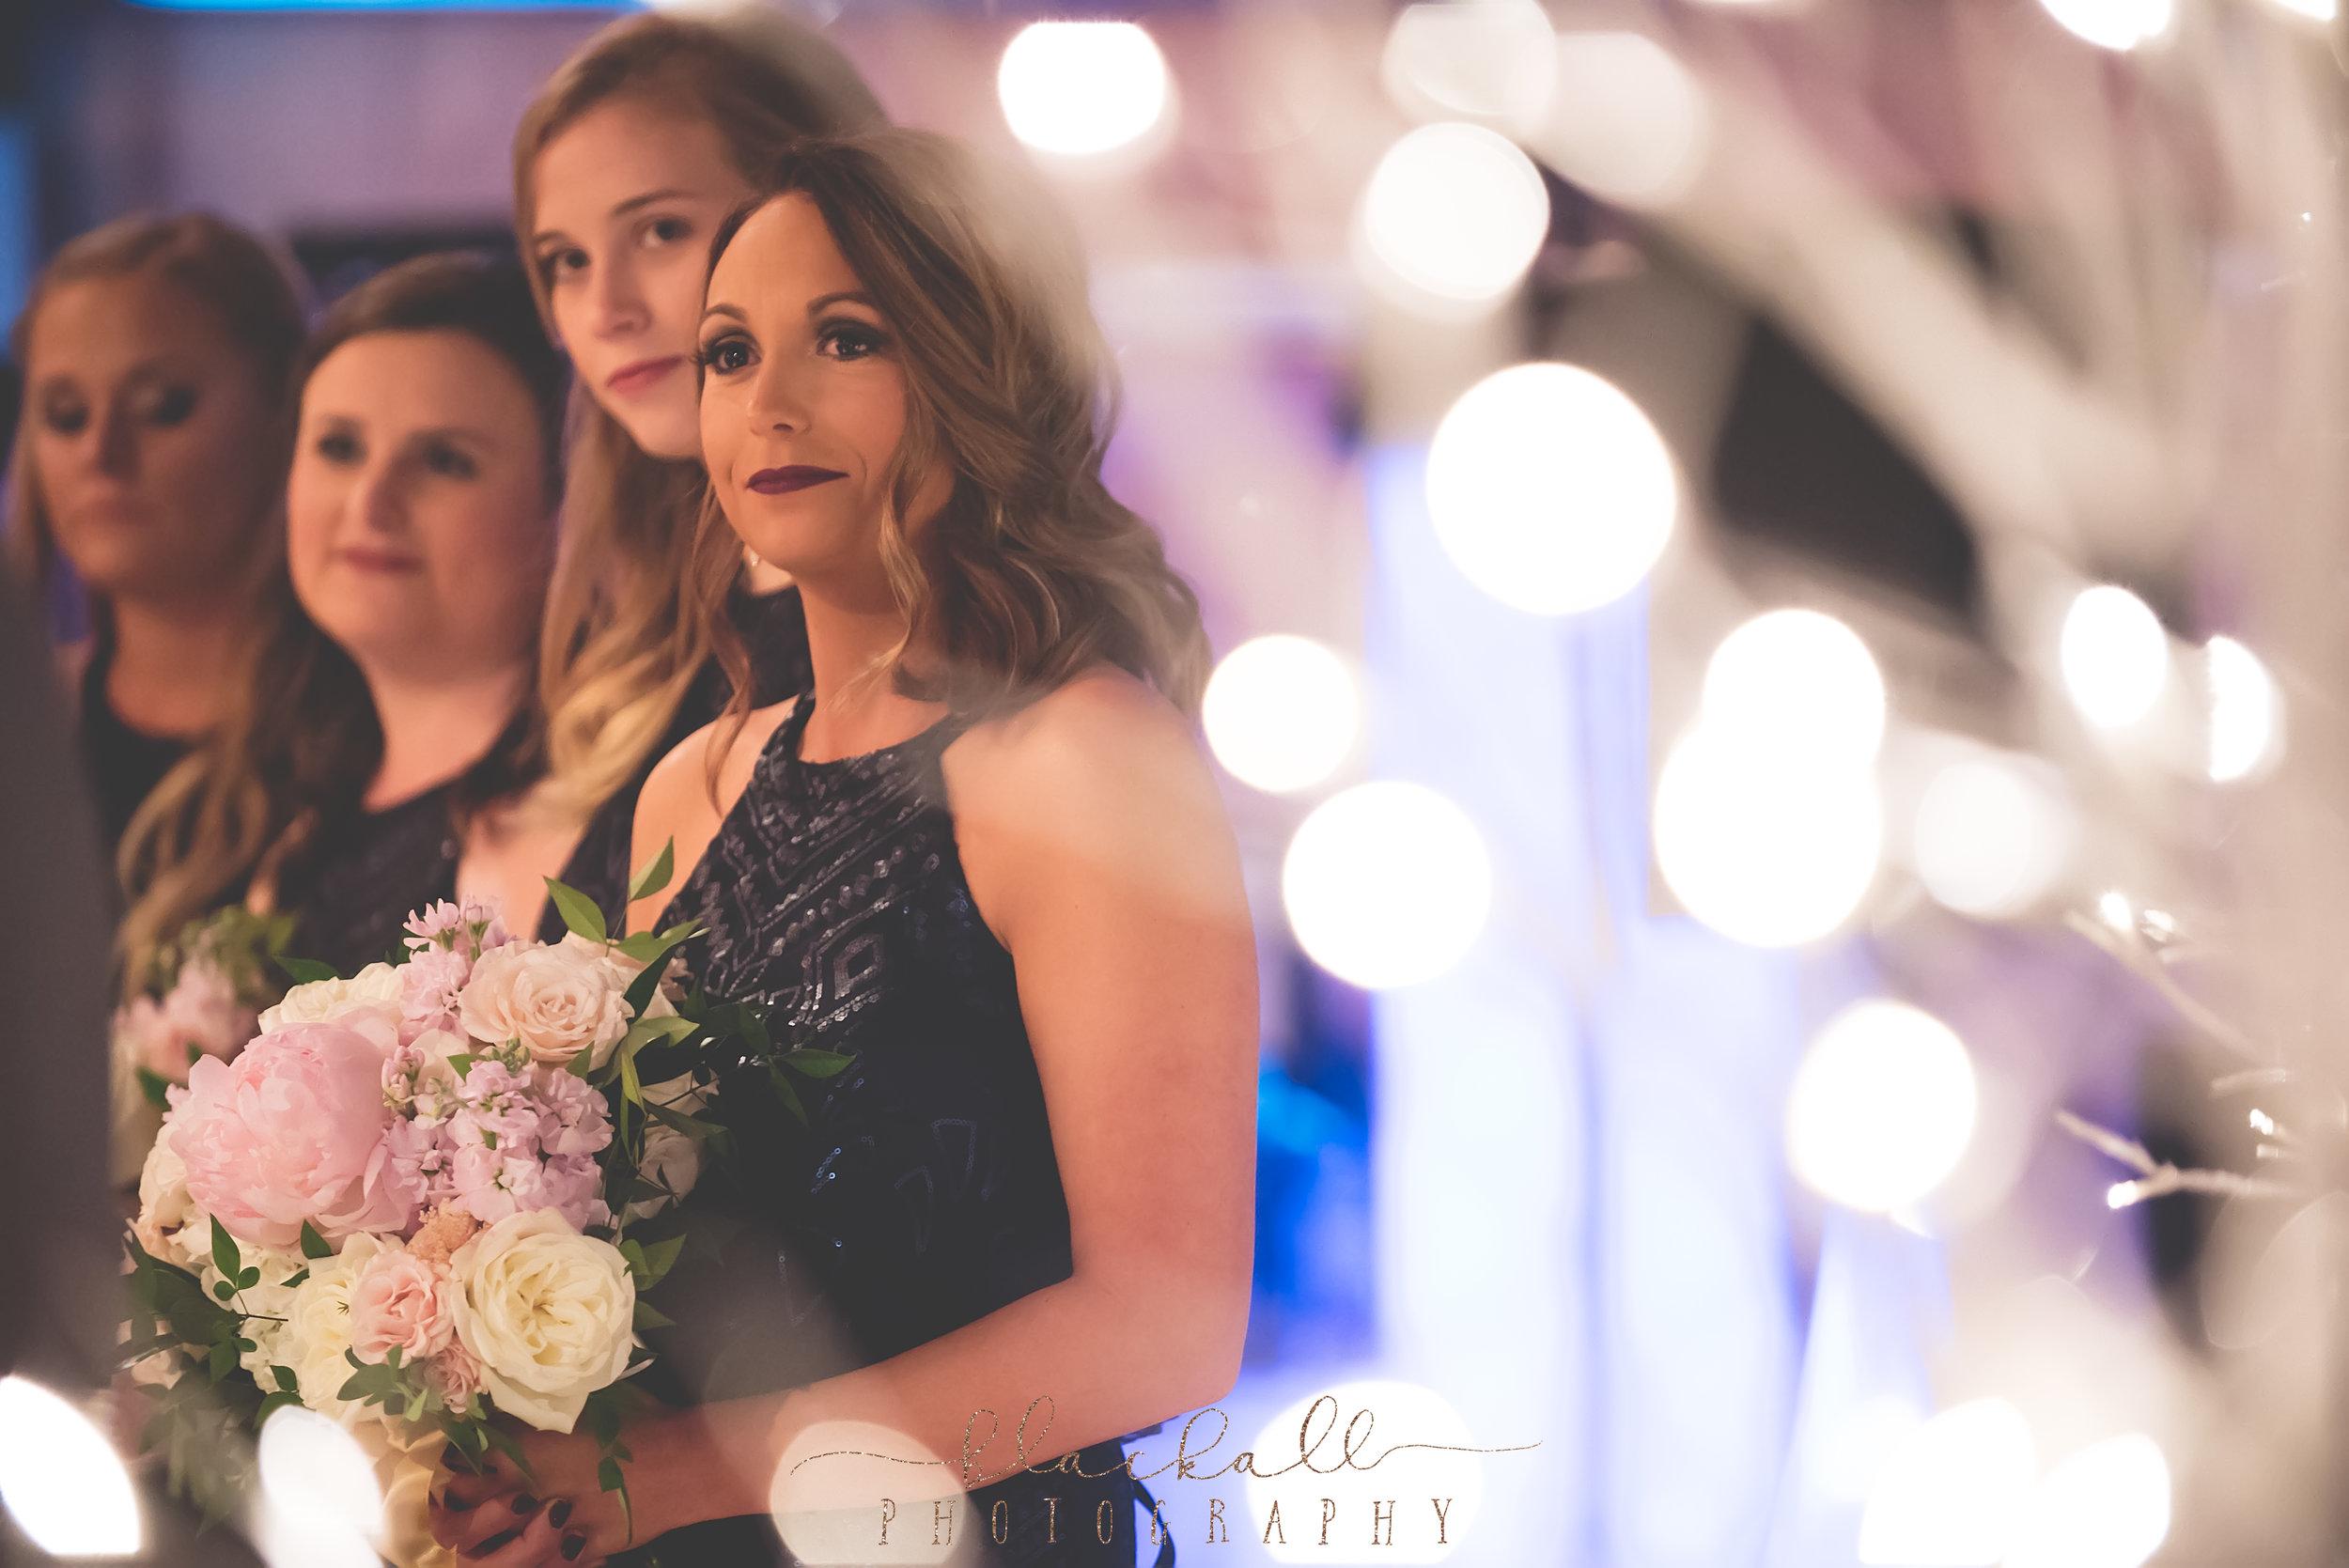 M&M WEDDING_Blackall Photography-40.JPG